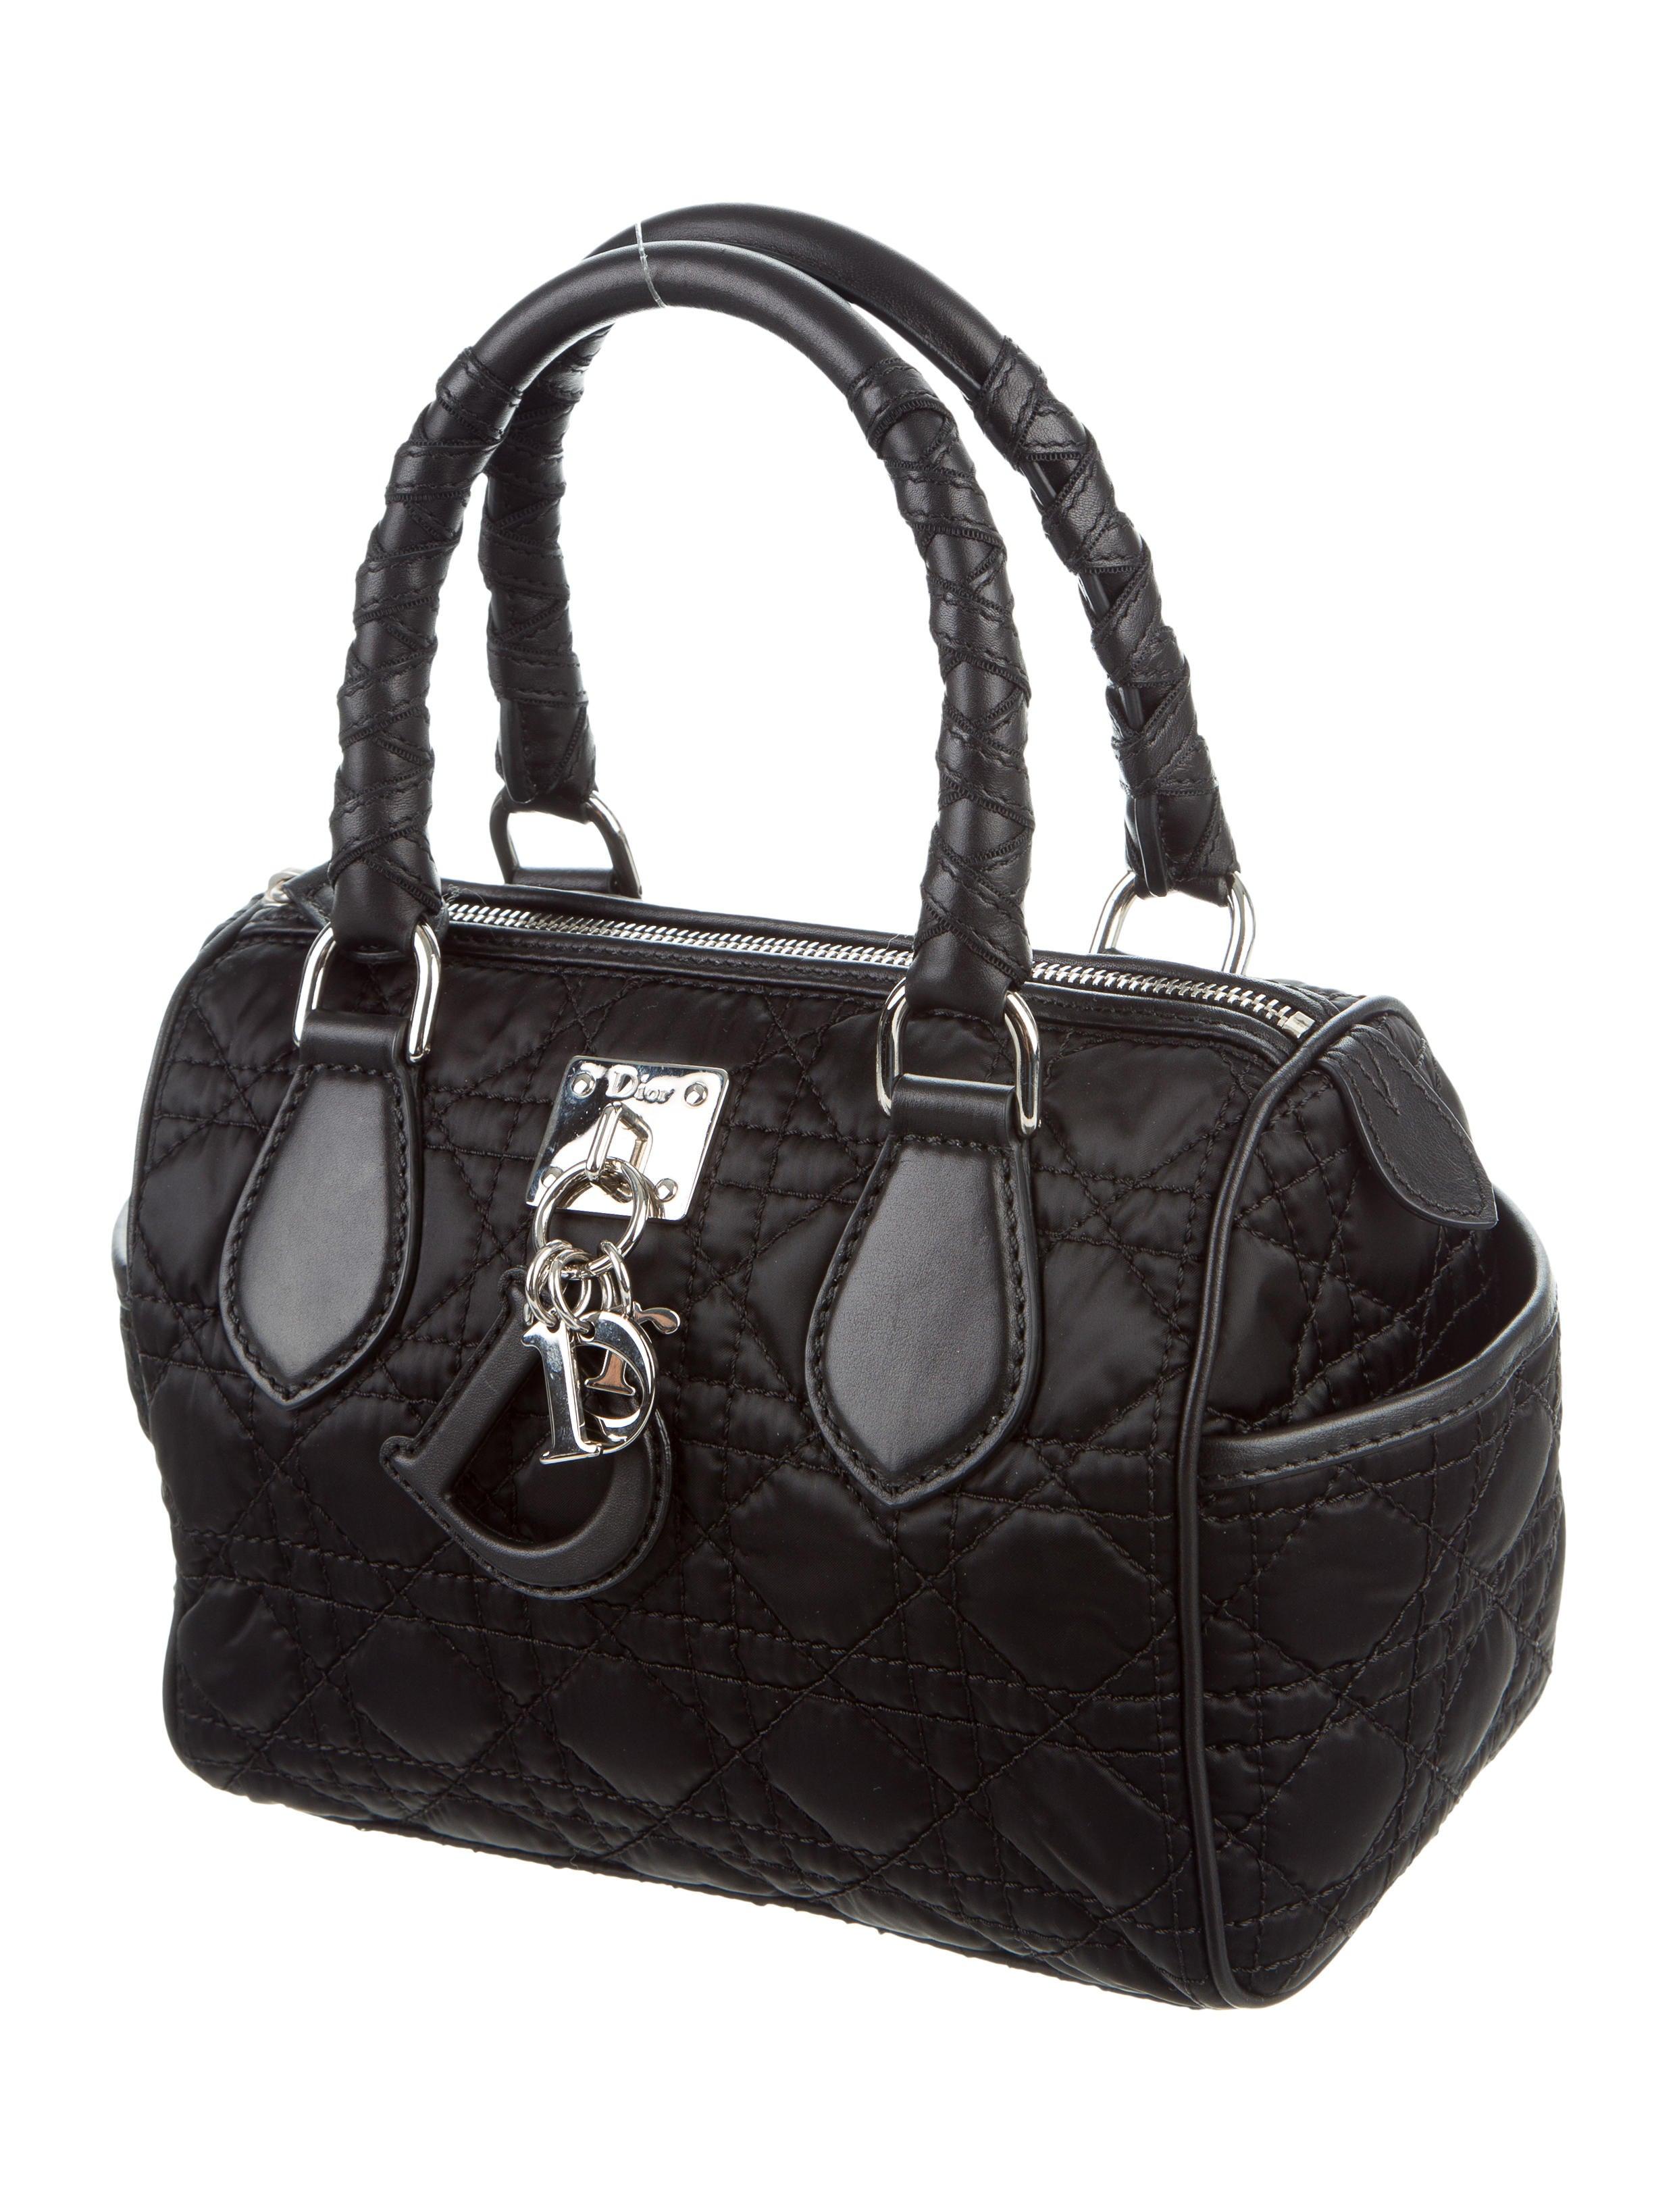 Boston Bag Patchwork Tutorial: Christian Dior Mini Boston Bag - Handbags - CHR57756